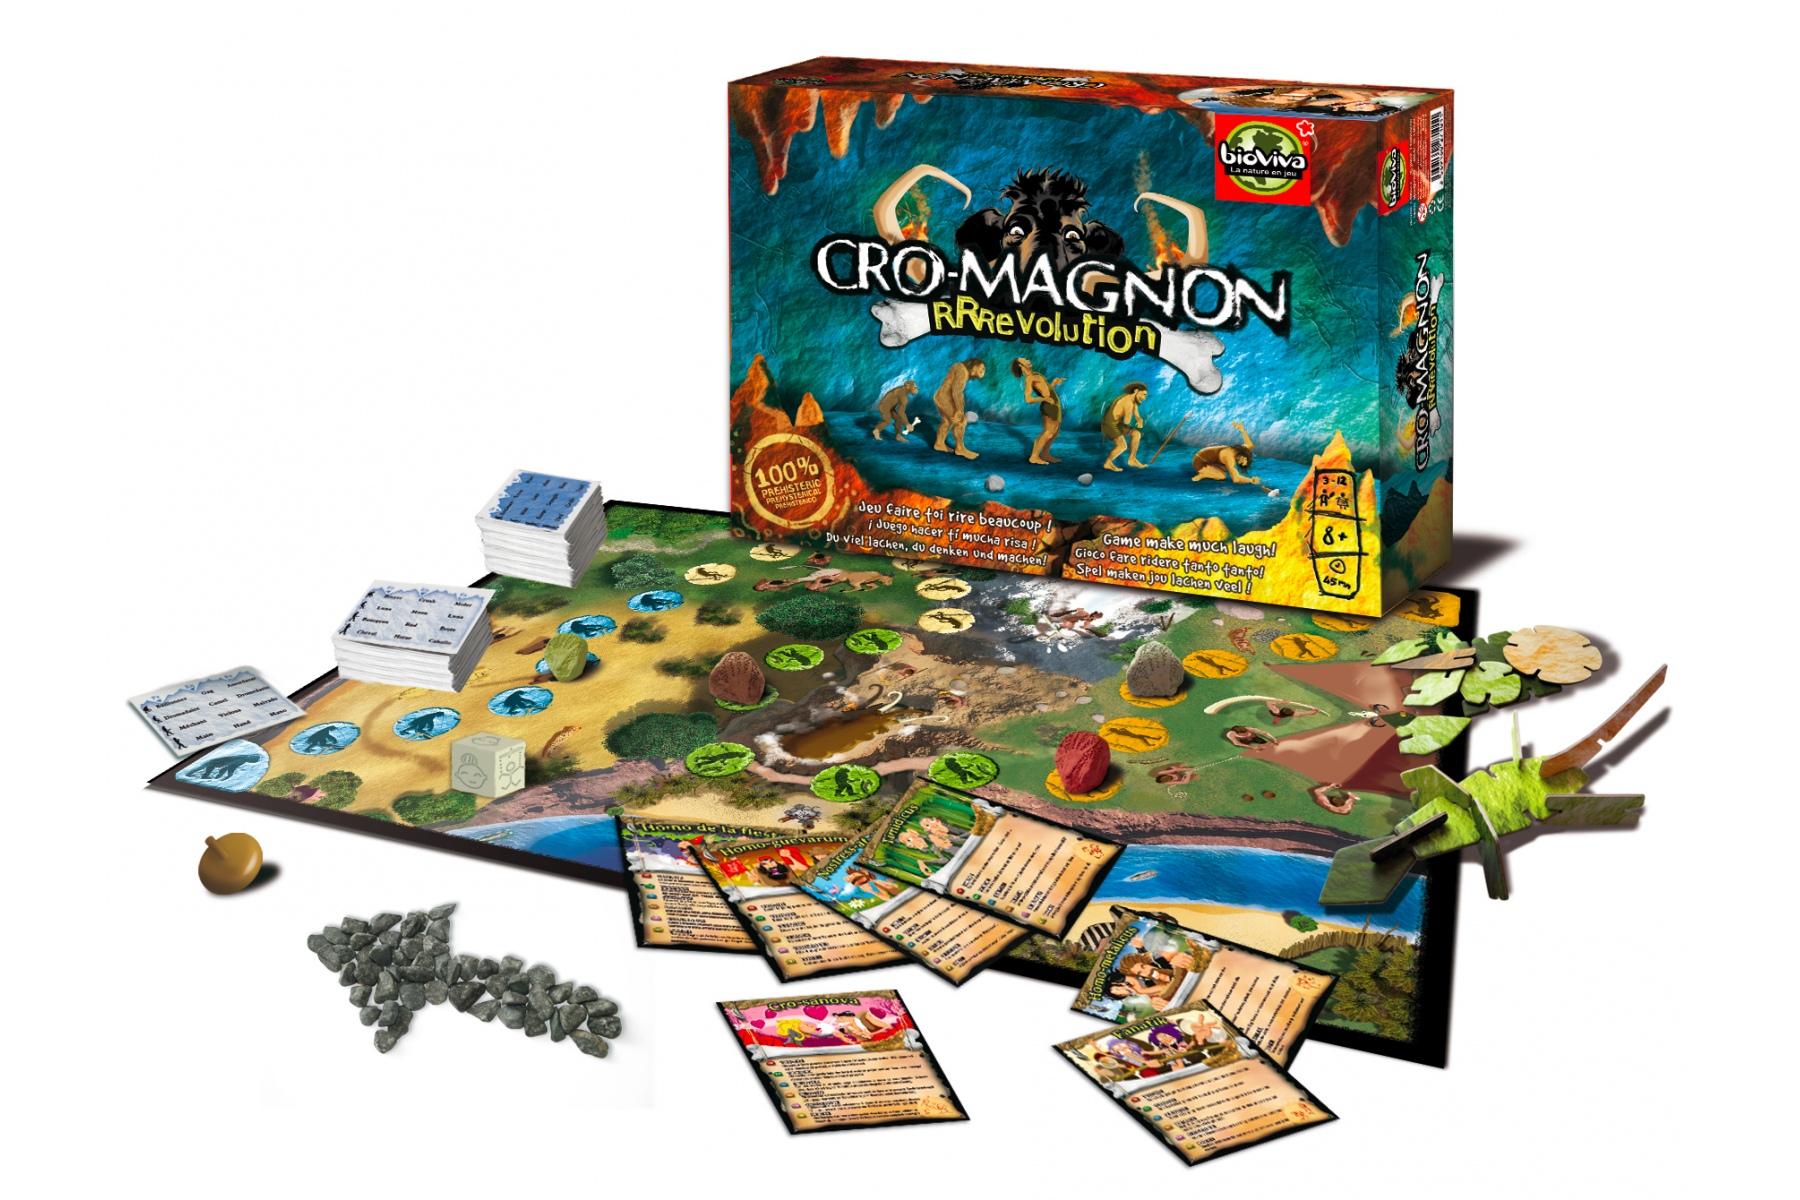 "Localisation of the board game Cro-magnon"""""